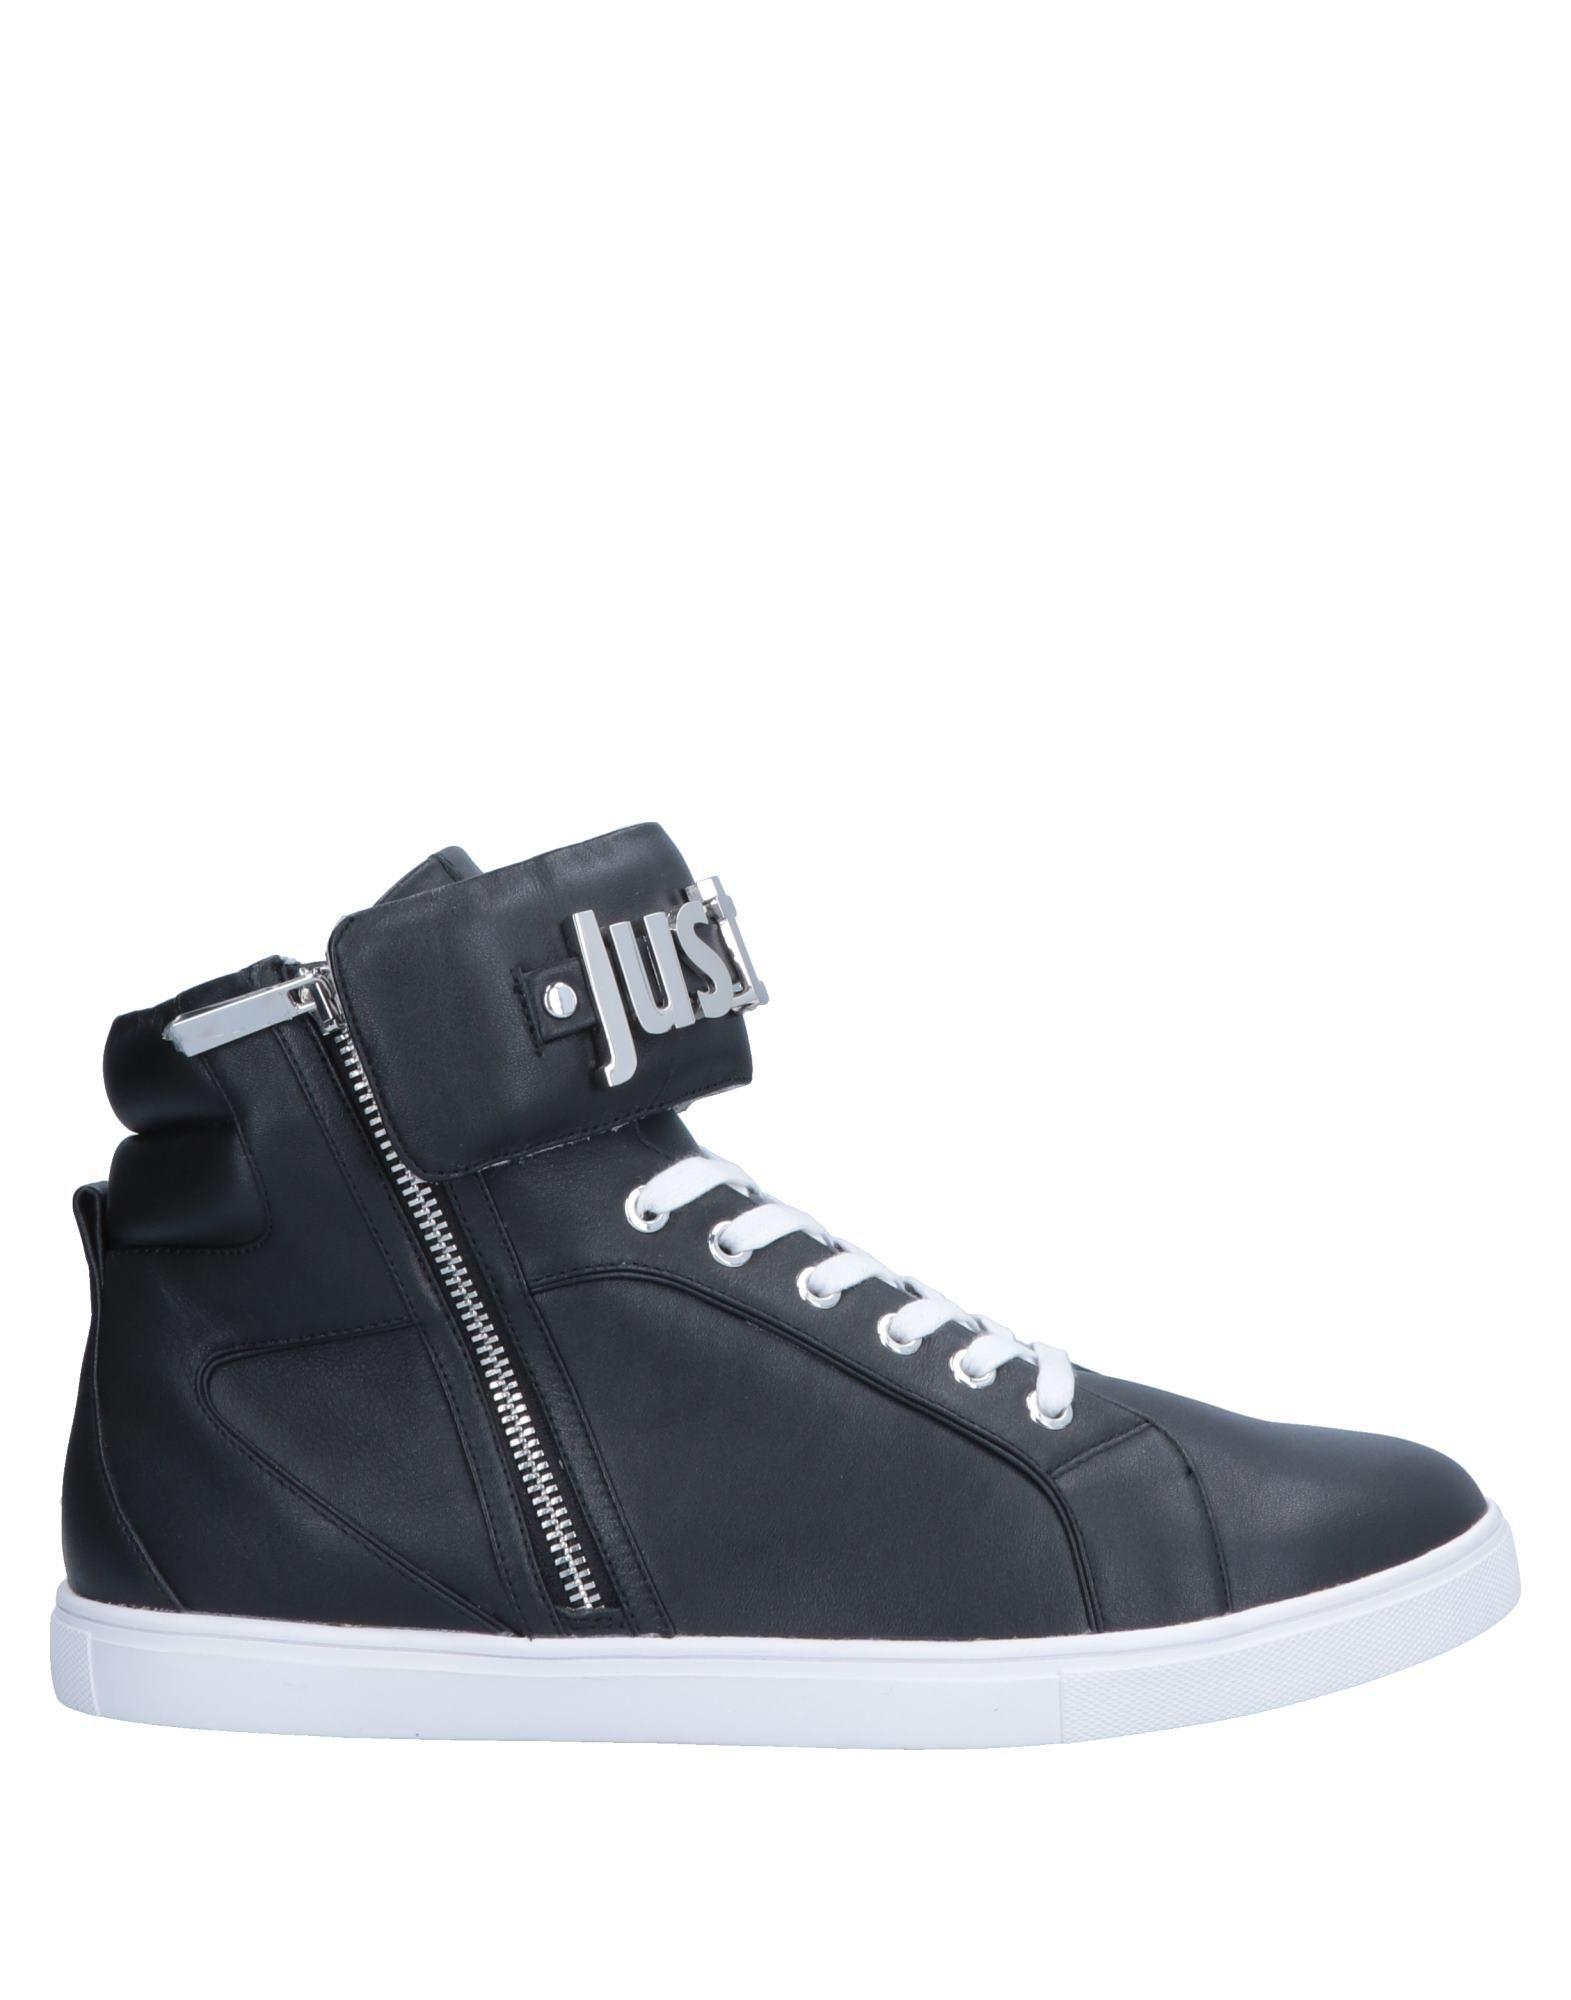 Just Just Cavalli Sneakers - Men Just Just Cavalli Sneakers online on  Australia - 11560602OO 3a44c9